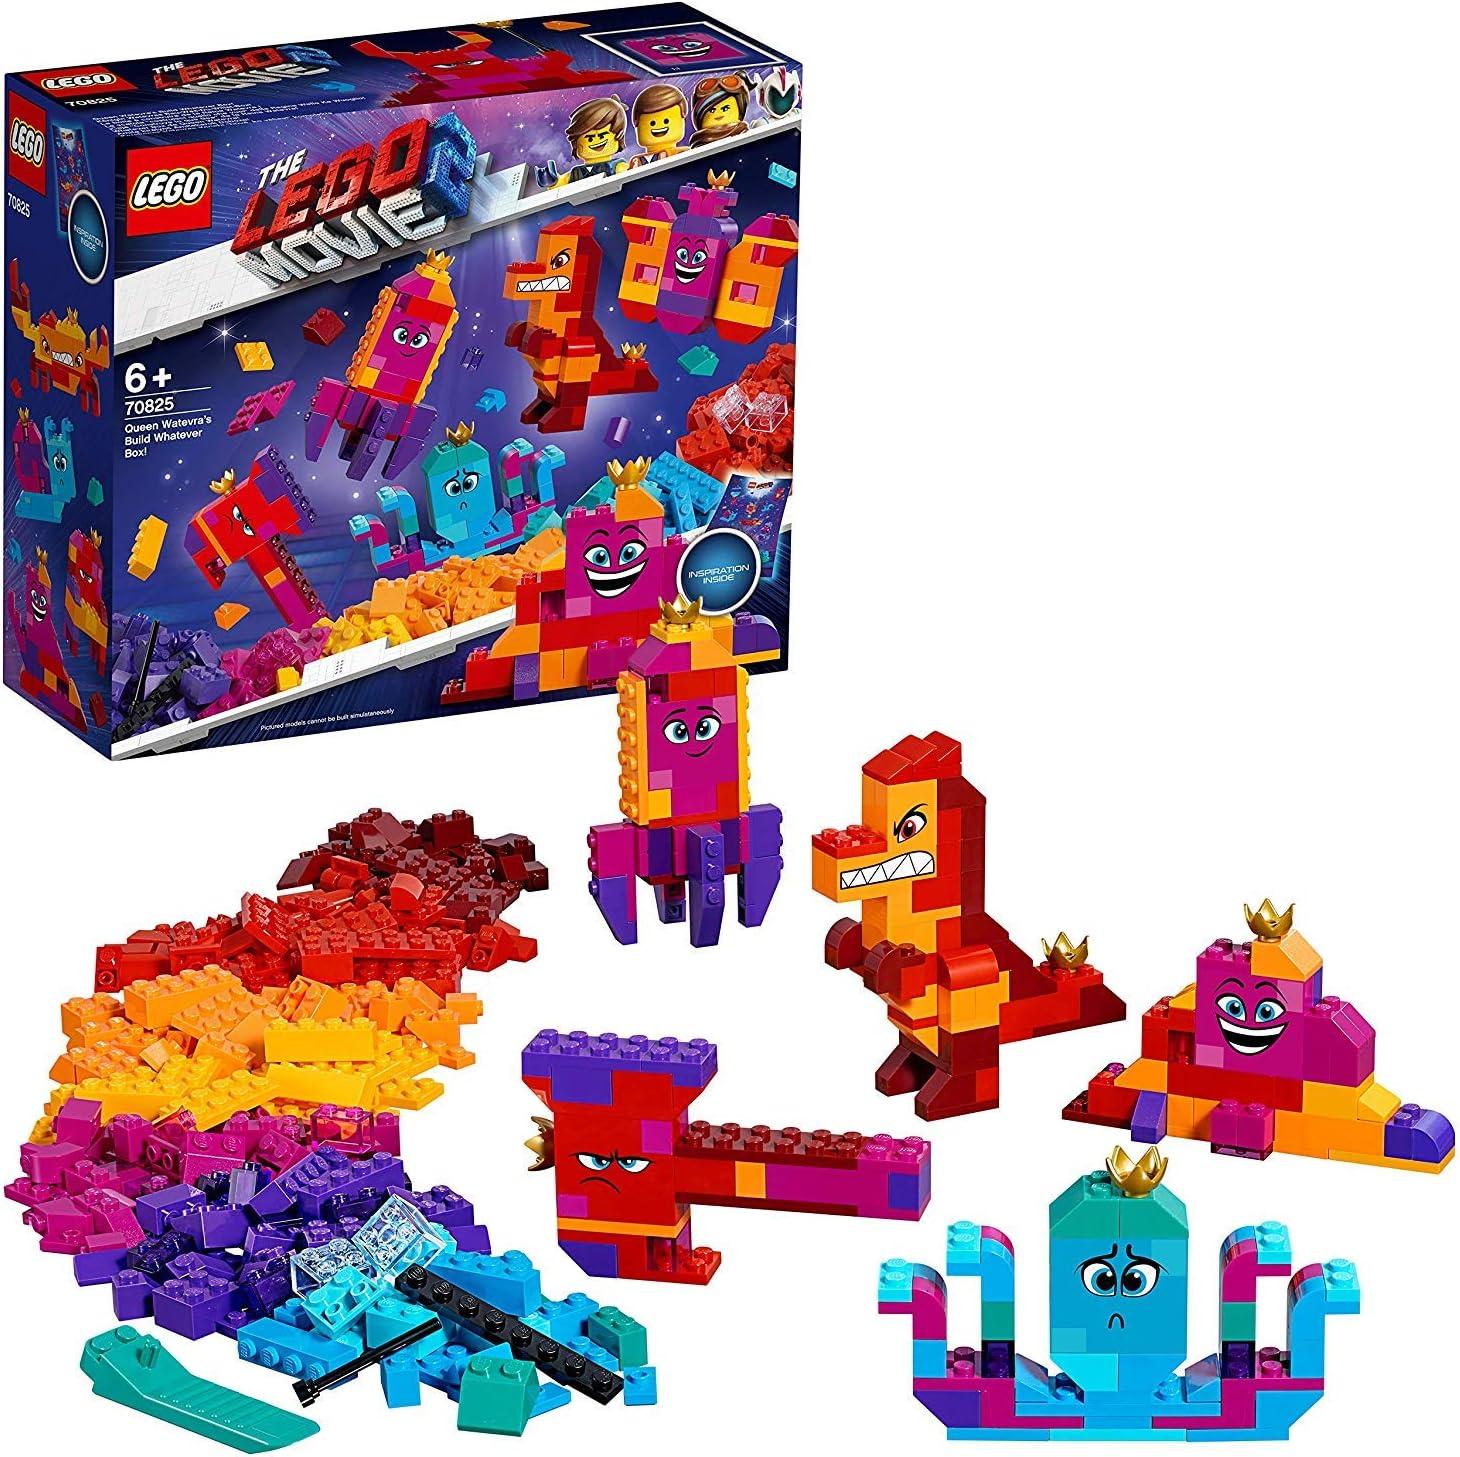 LEGO Queen Watevra'S Build Whatever Box